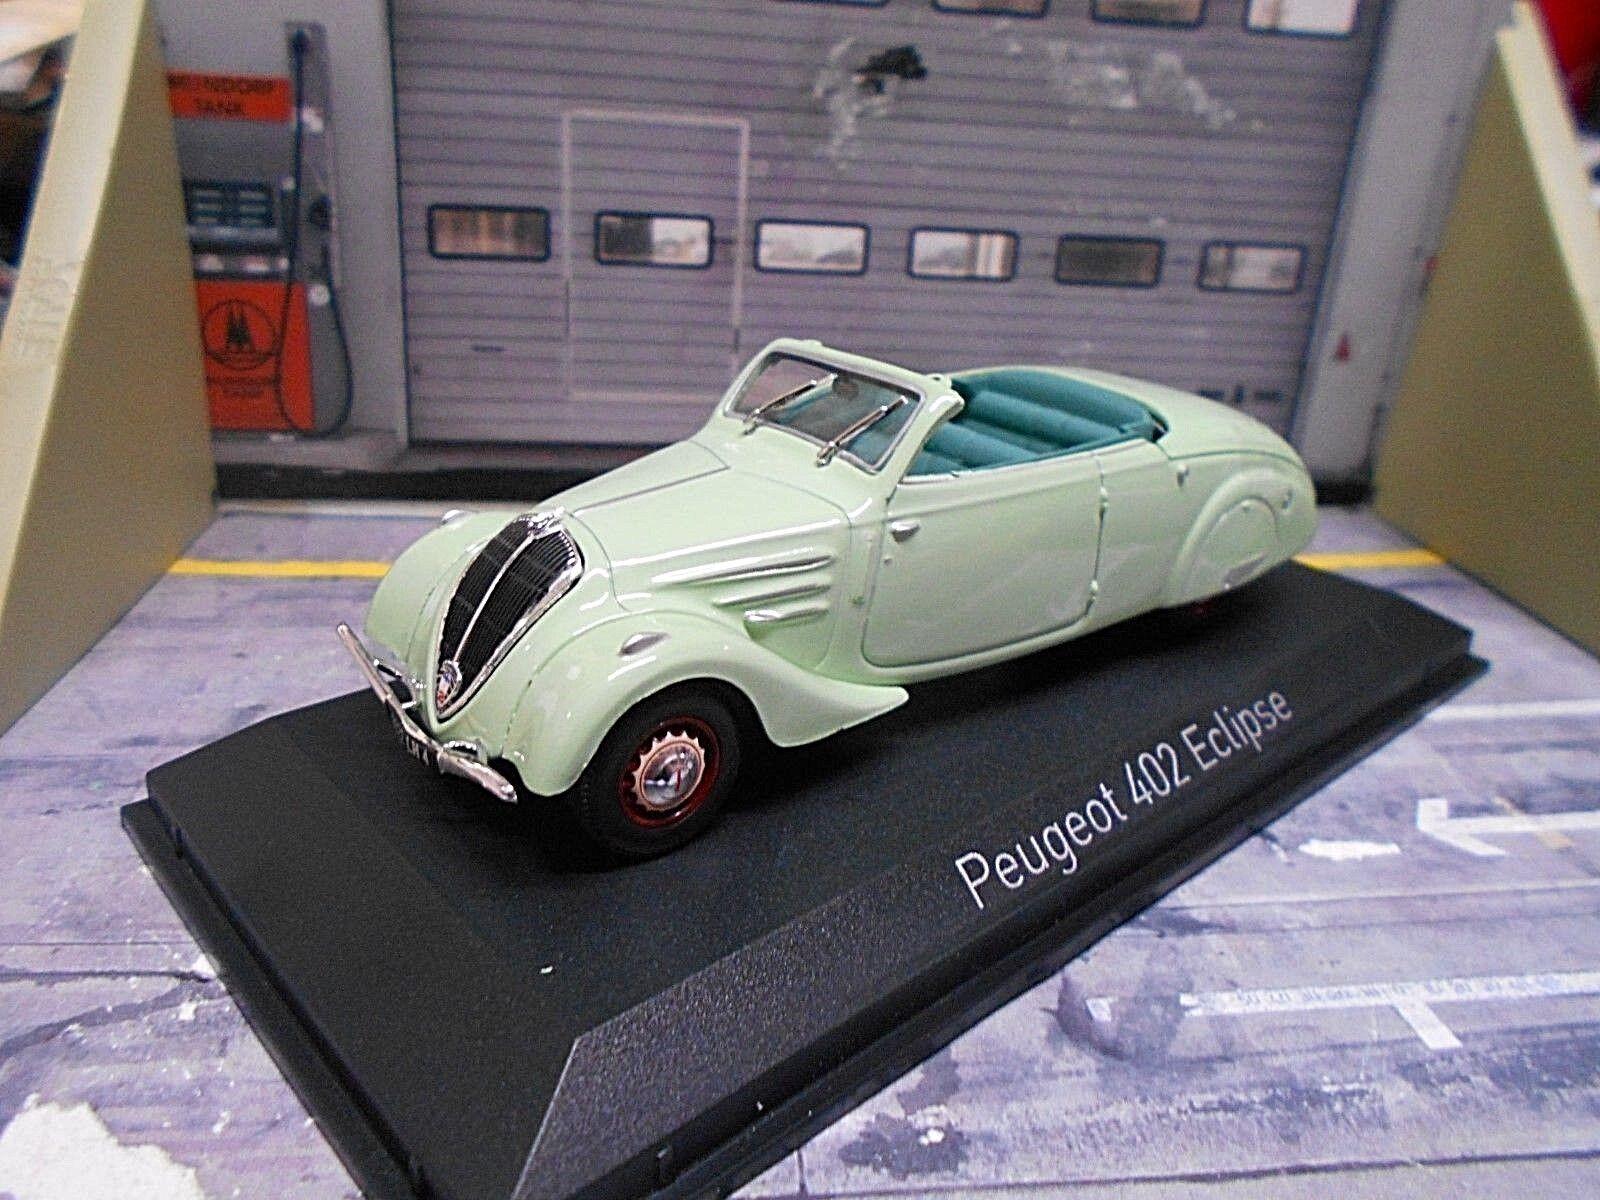 PEUGEOT 402 Eclipse Oldtimer 1937 Cabrio Grün grün 474218 Norev 1 43    Trendy